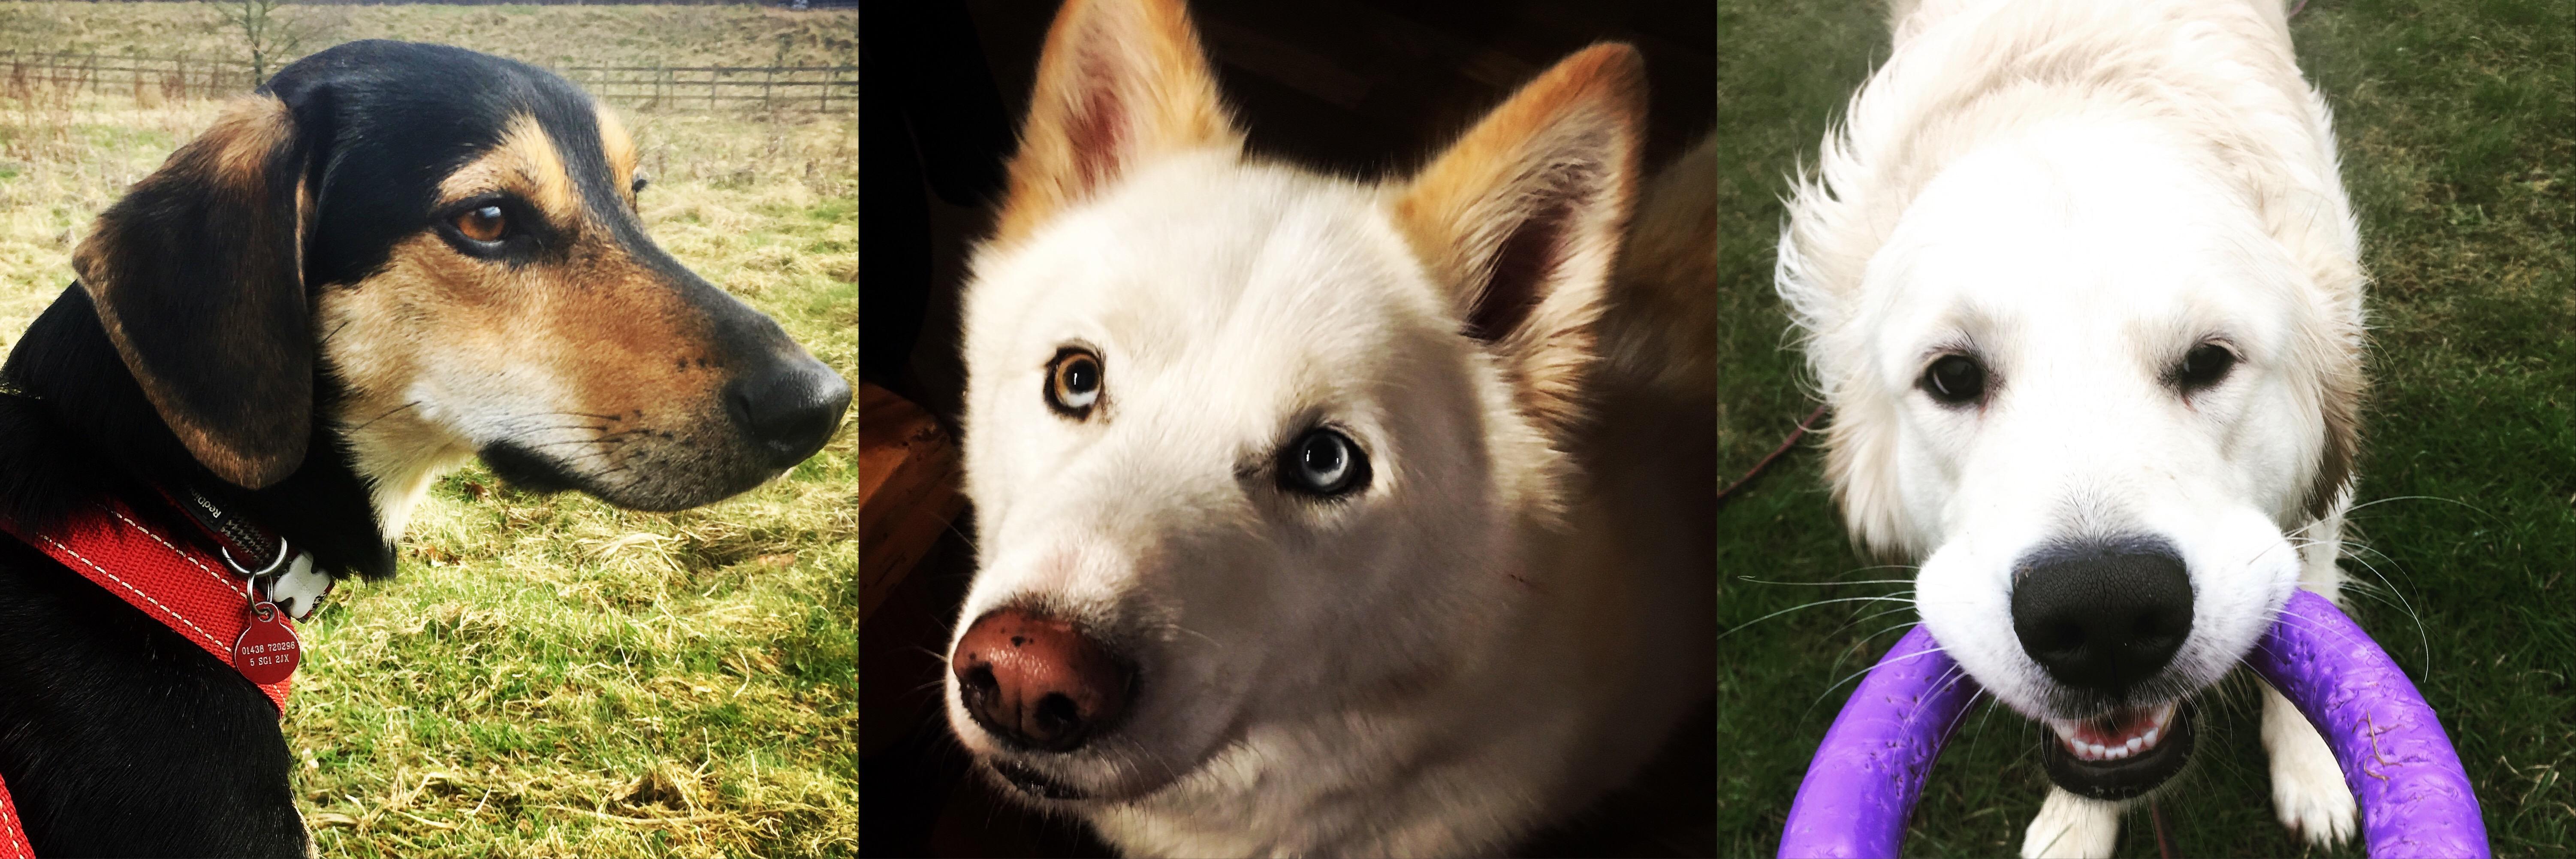 Hund med problemadferd